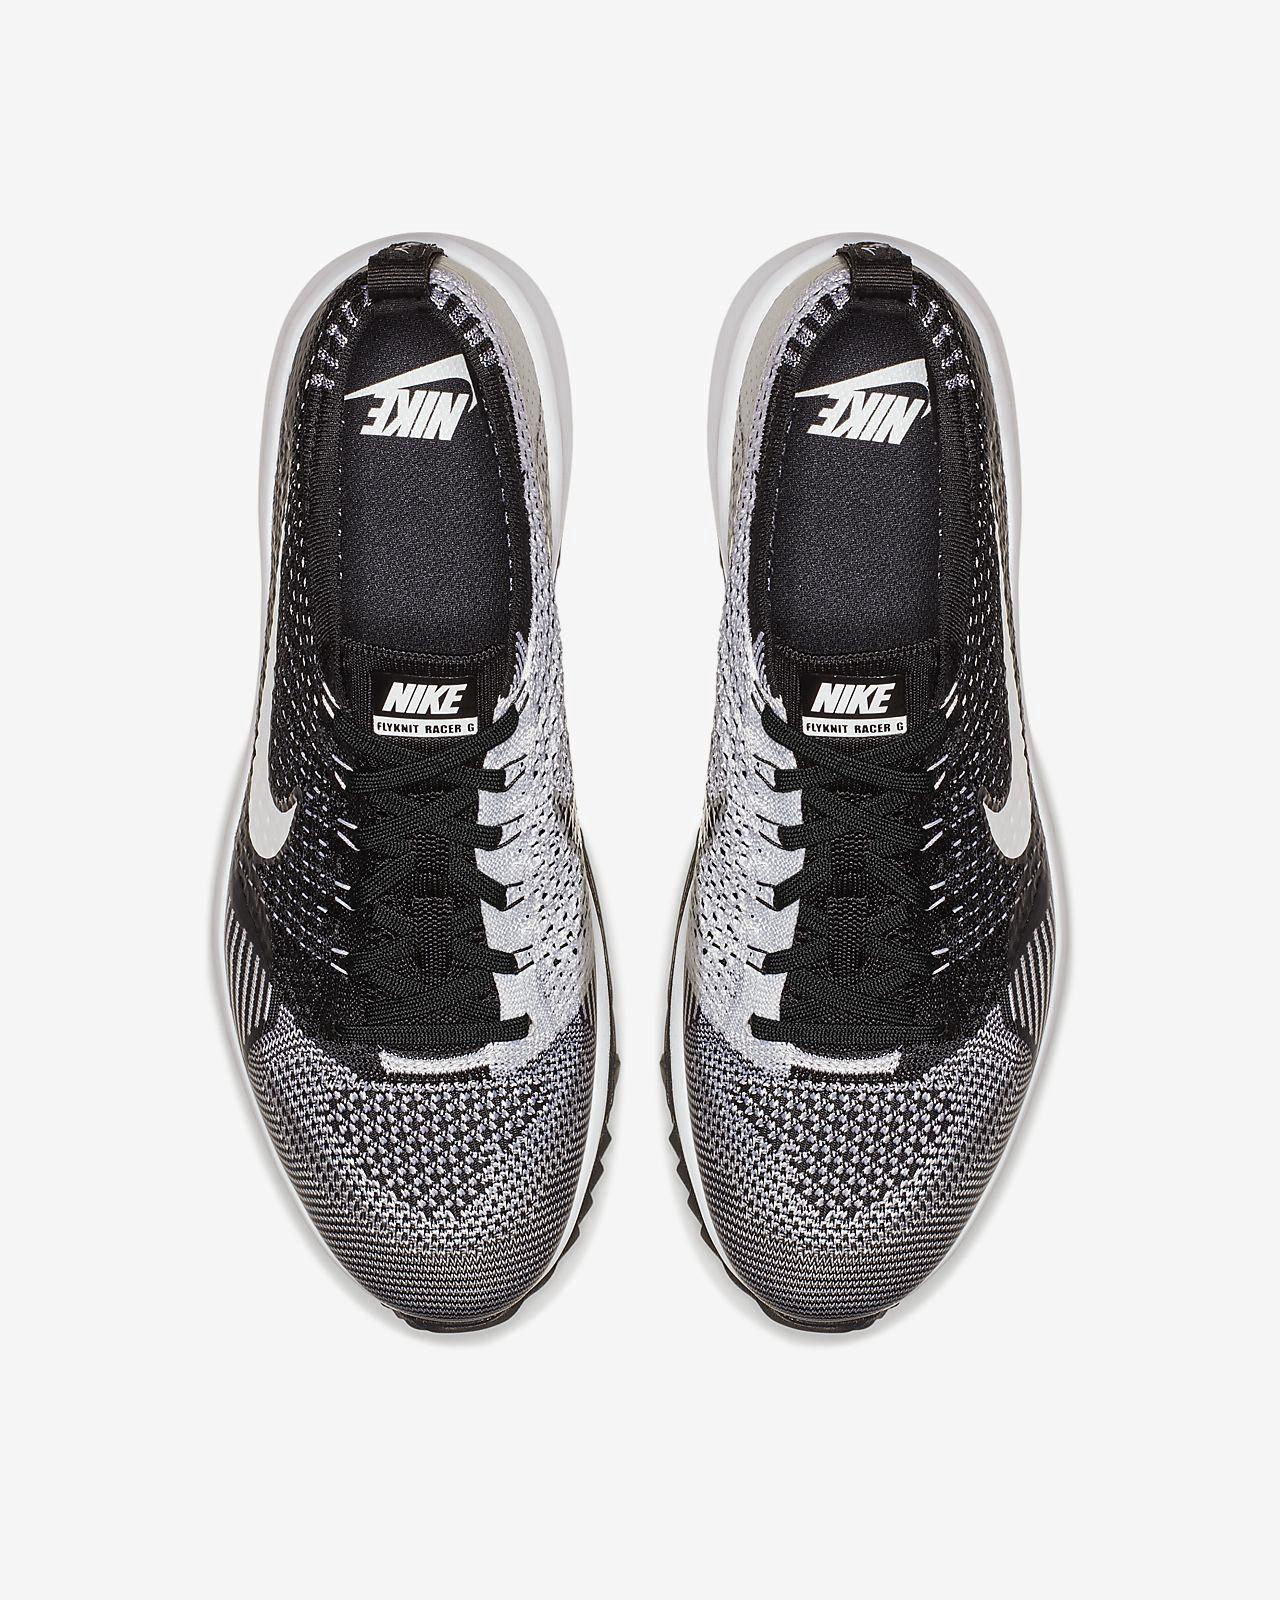 40b58515bf641 Nike Flyknit Racer G Men s Golf Shoe - 11.5  MensGolf